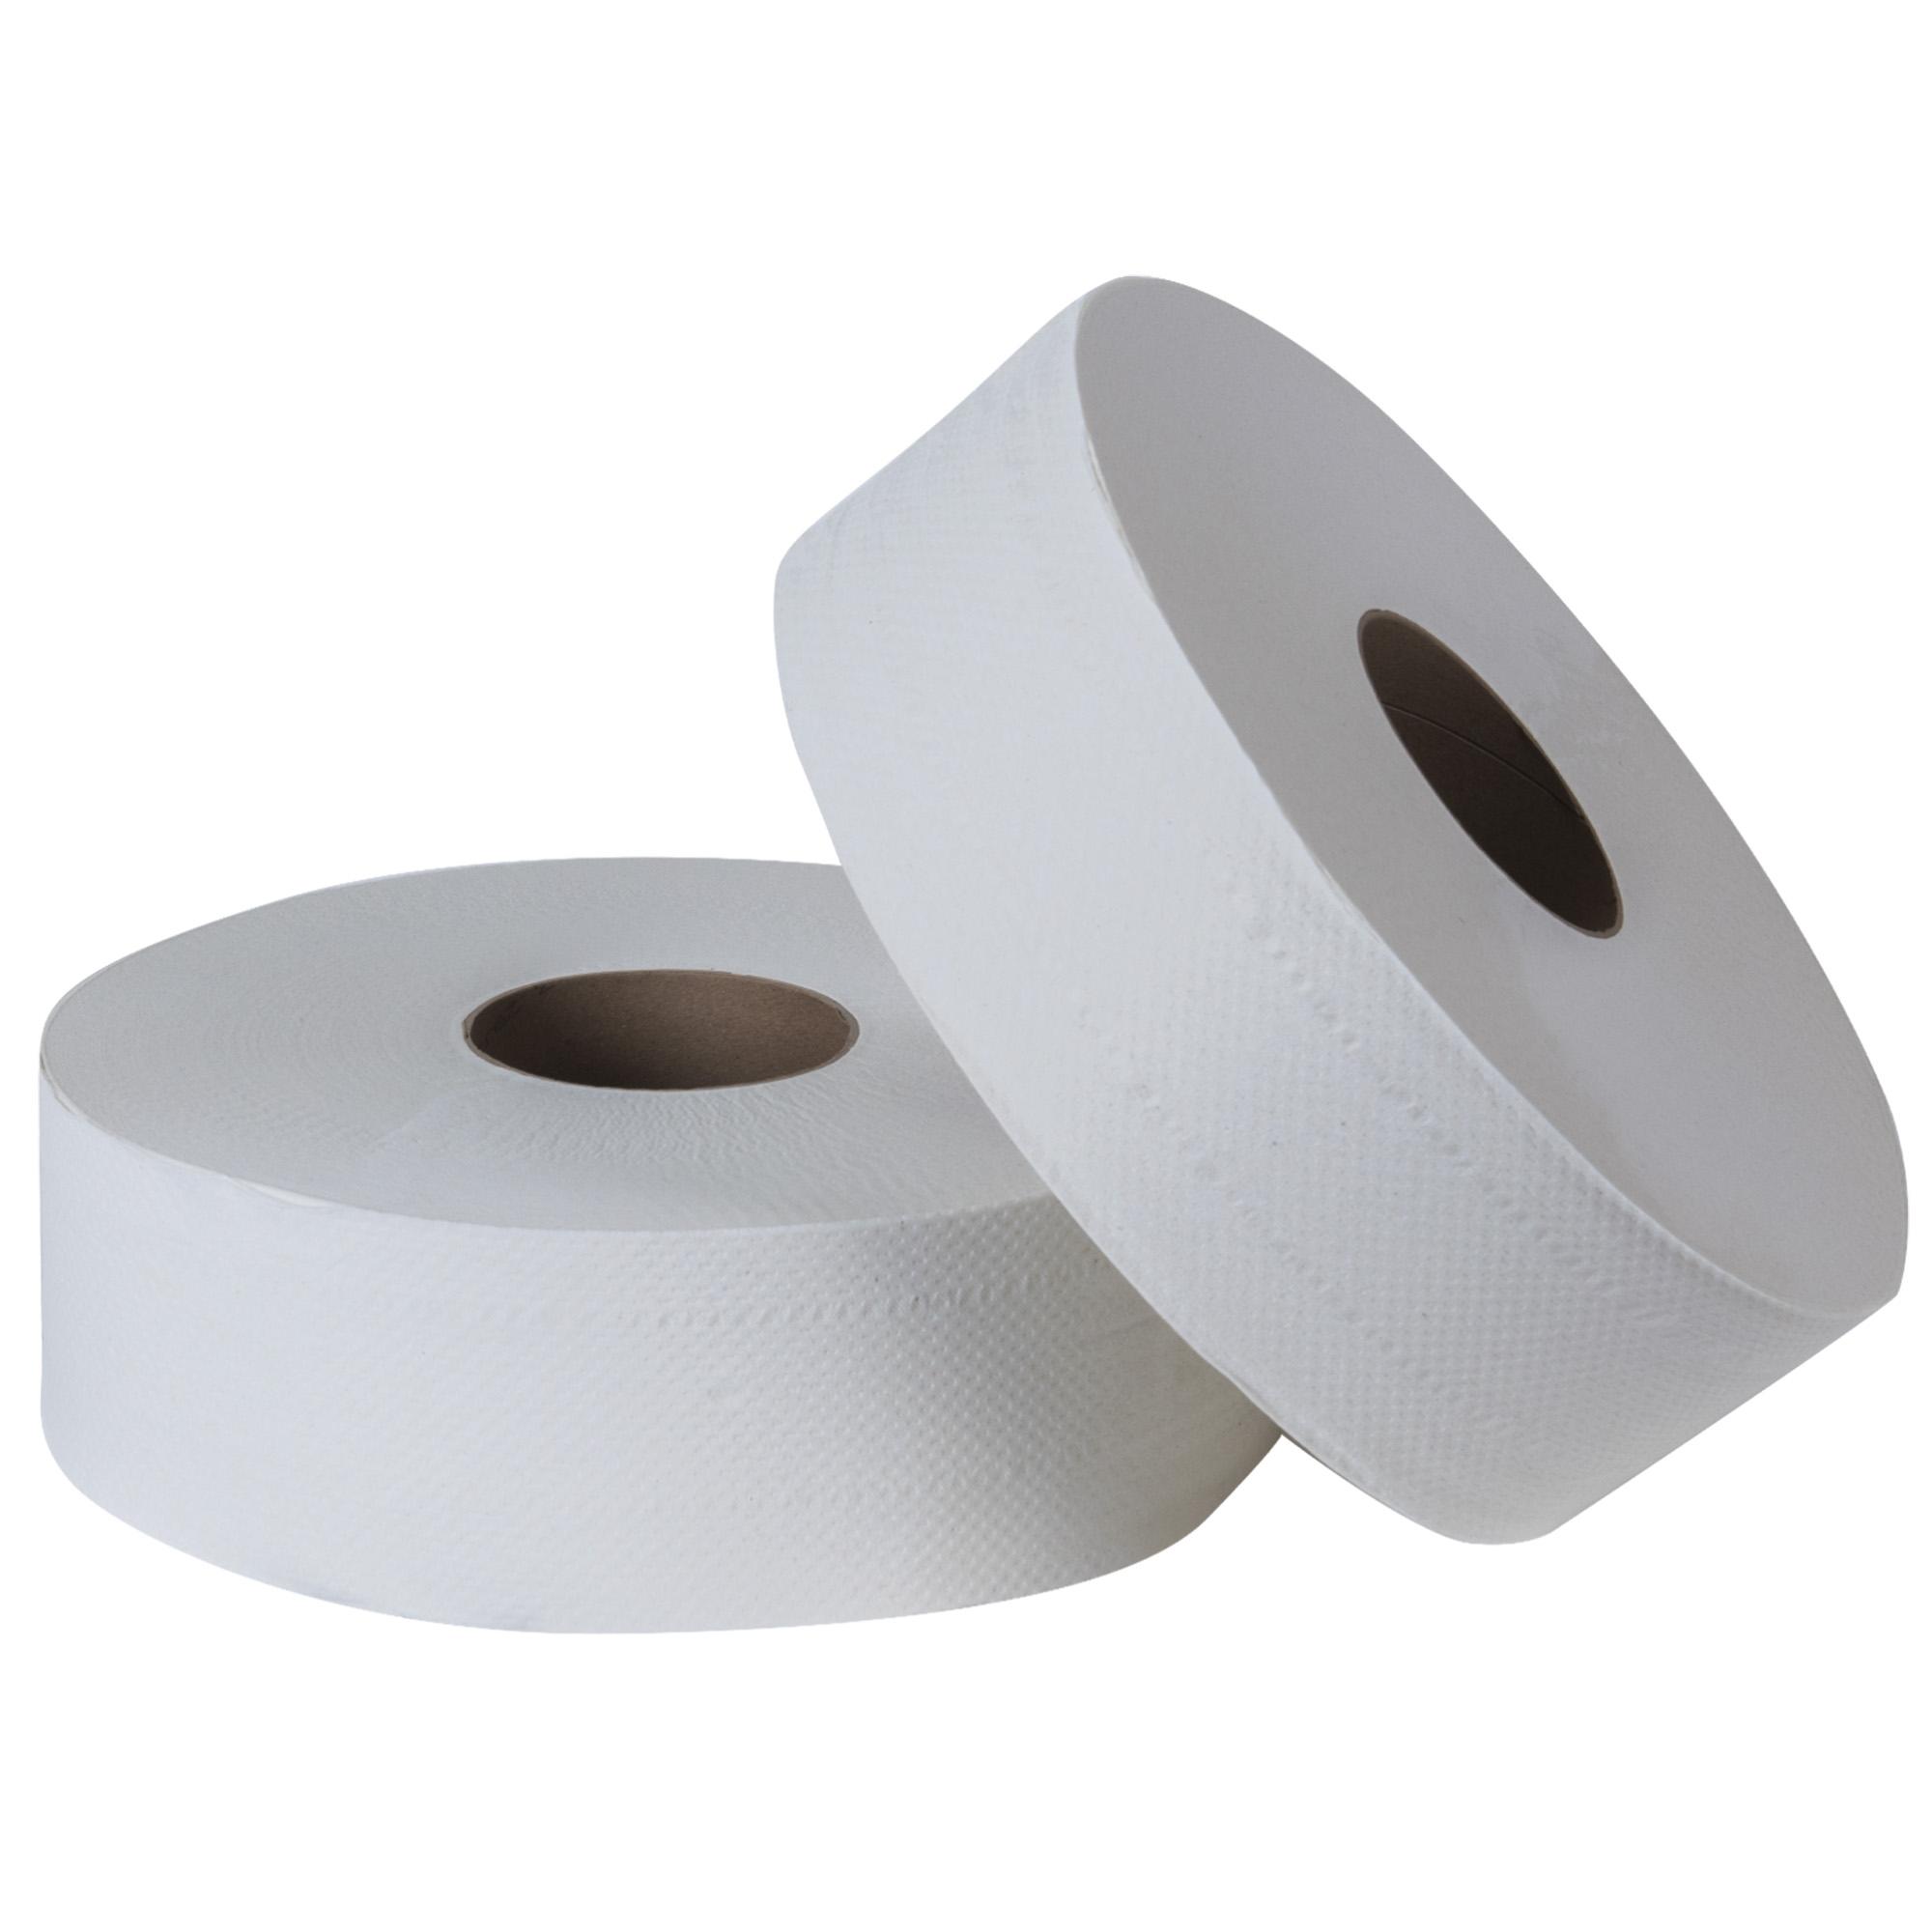 Tork 700153 Higiénico bobina universal hoja sencilla color blanco 400 mts jumbo c/6 1